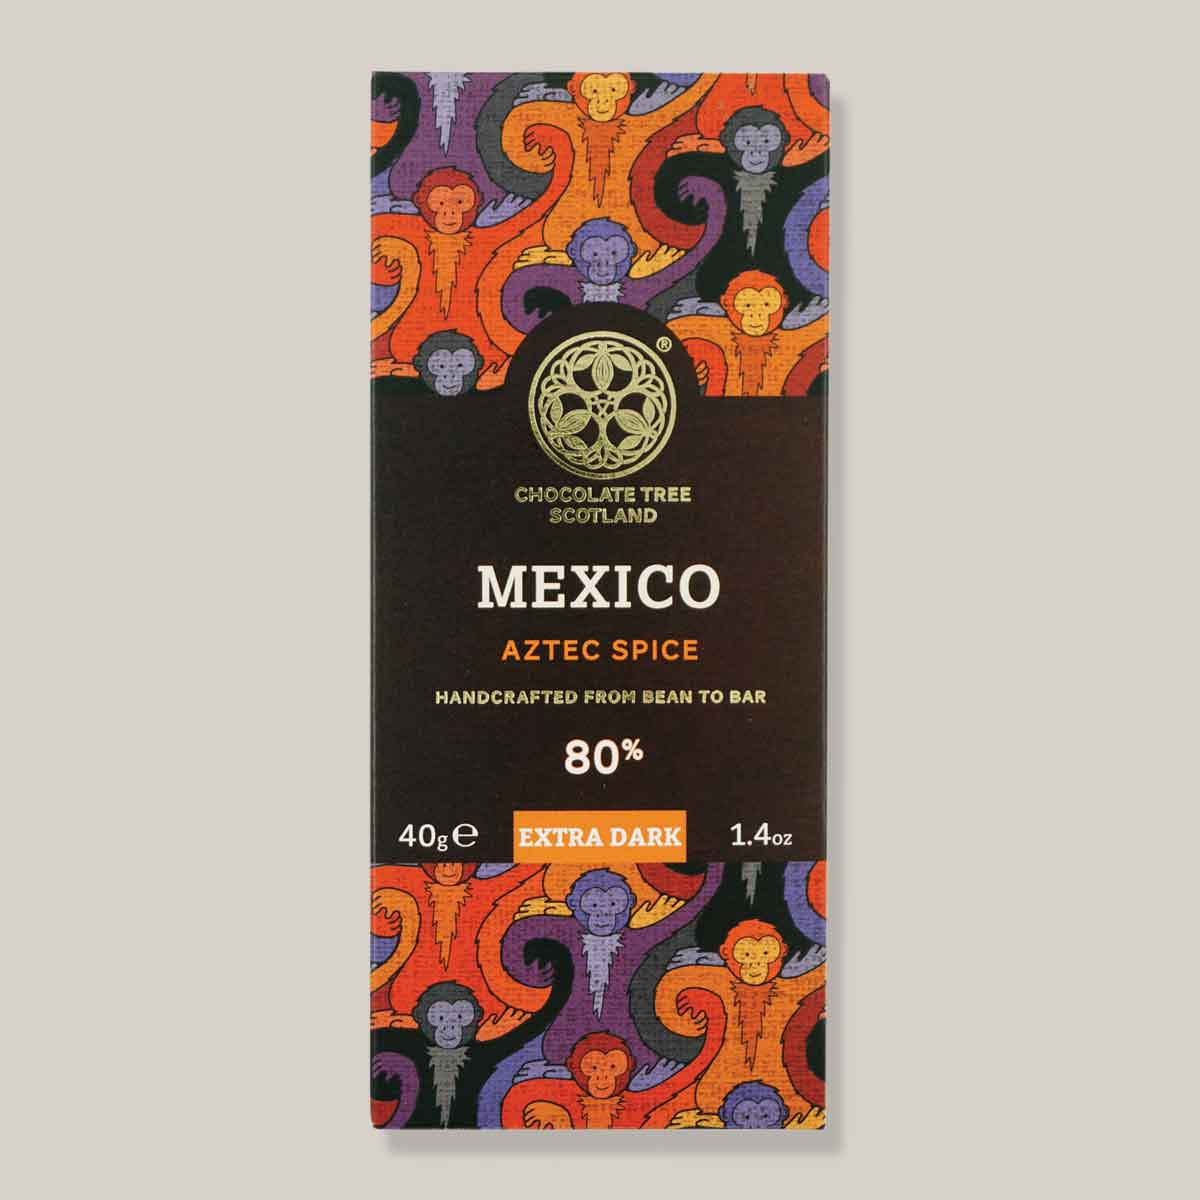 Chocolate Tree Mexico aztec spice 80% extra dark 40g reep